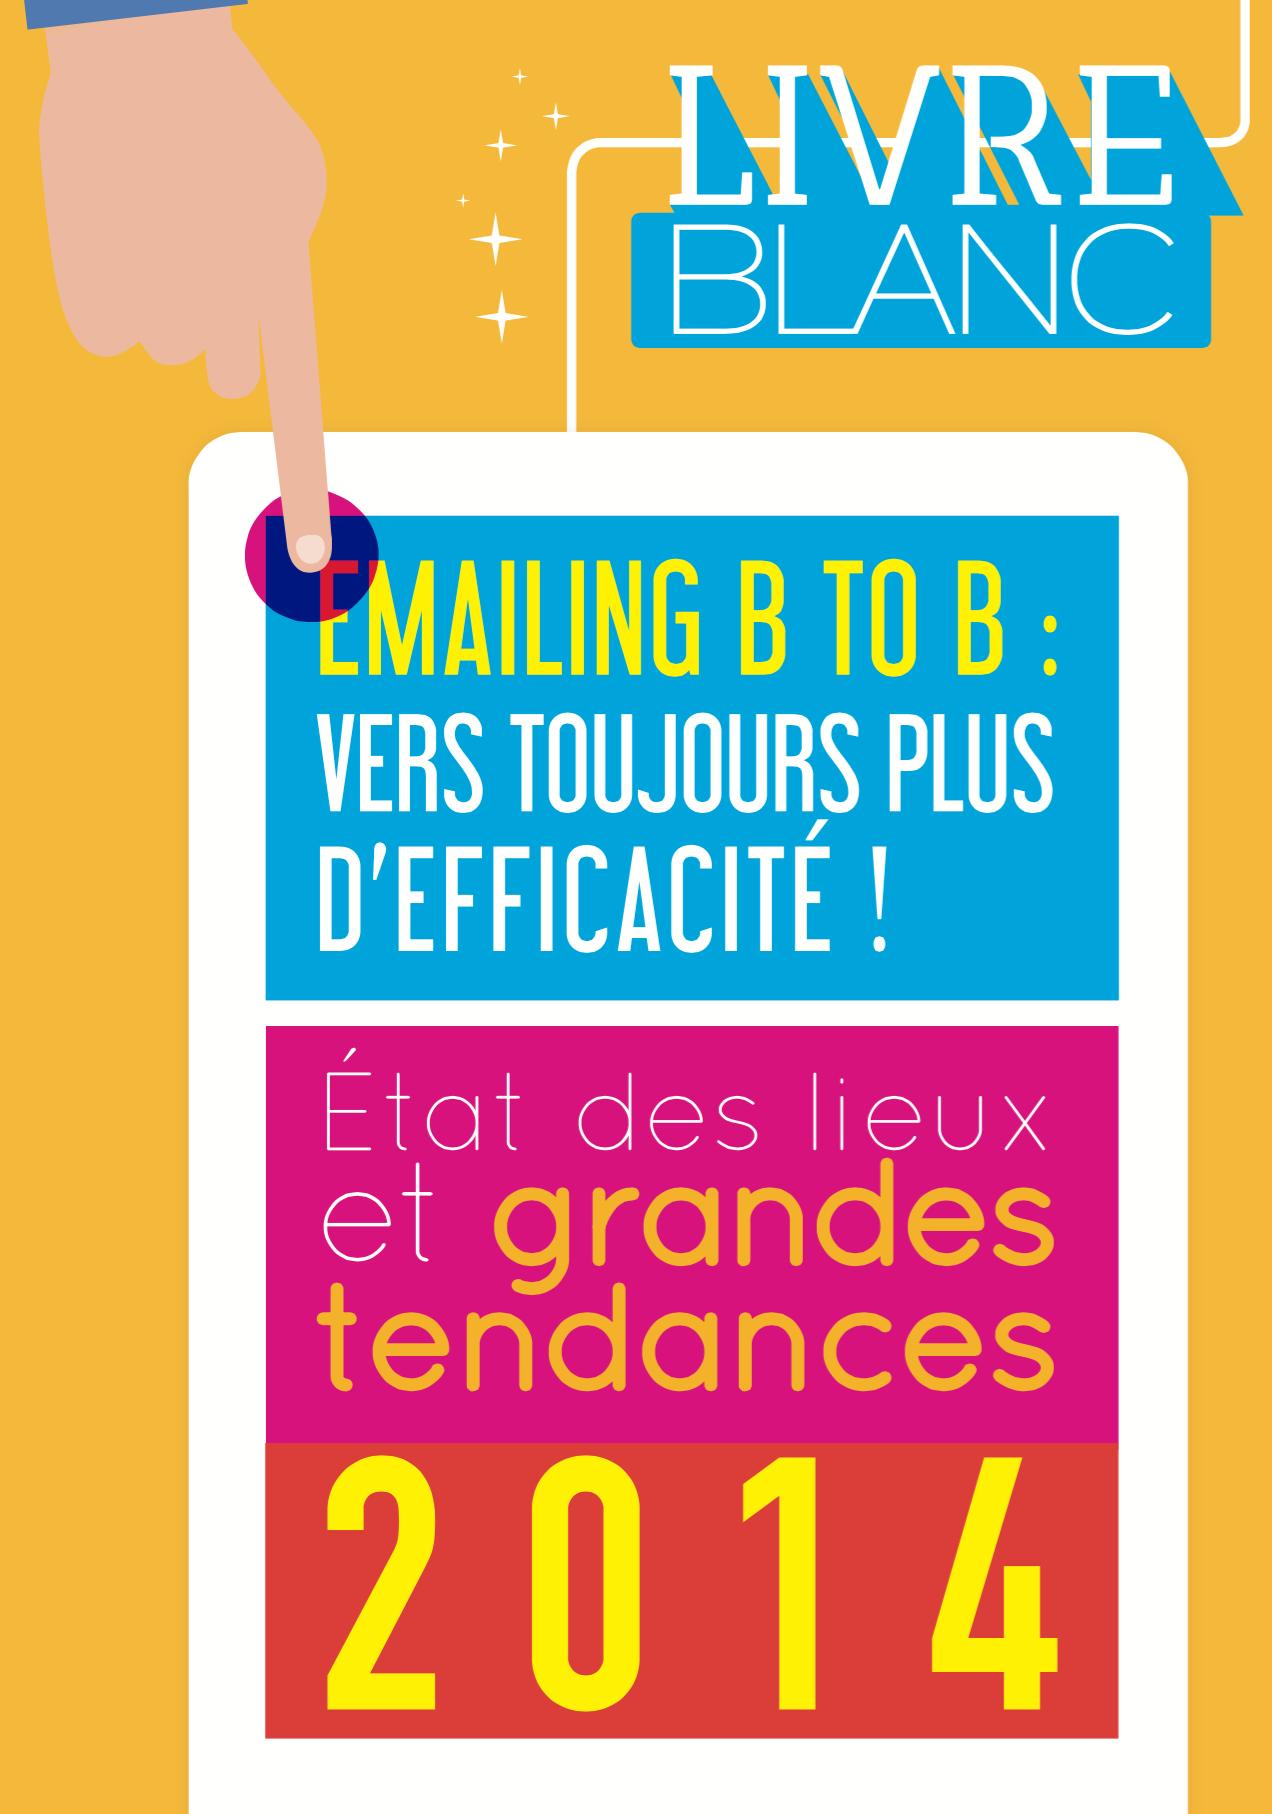 ZEBAZ_Livre_Blanc-Emailing BtoB